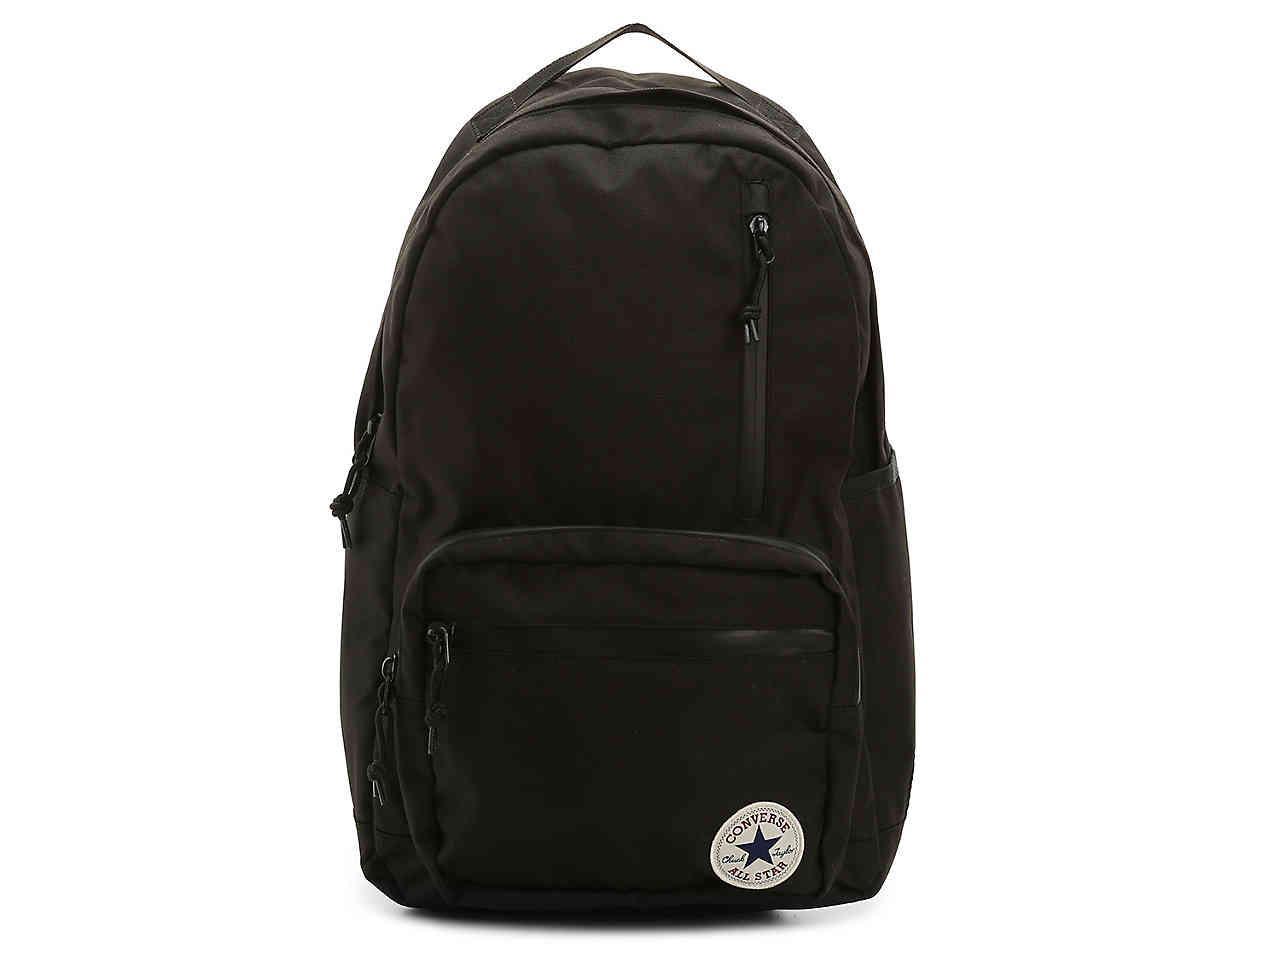 b0990b3cbf85 Lyst - Converse Go Backpack in Black